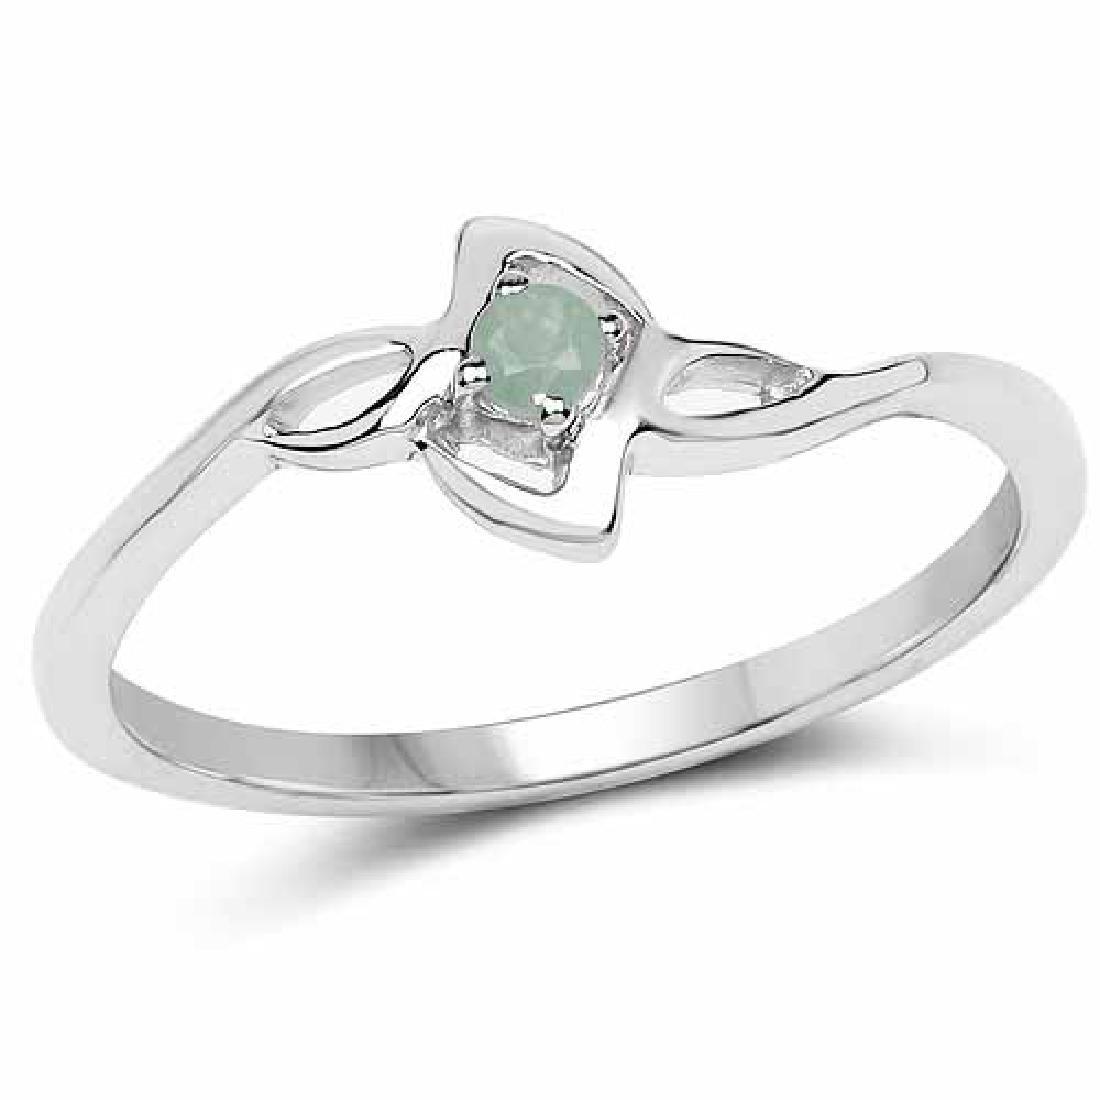 0.06 Carat Genuine Emerald .925 Sterling Silver Ring